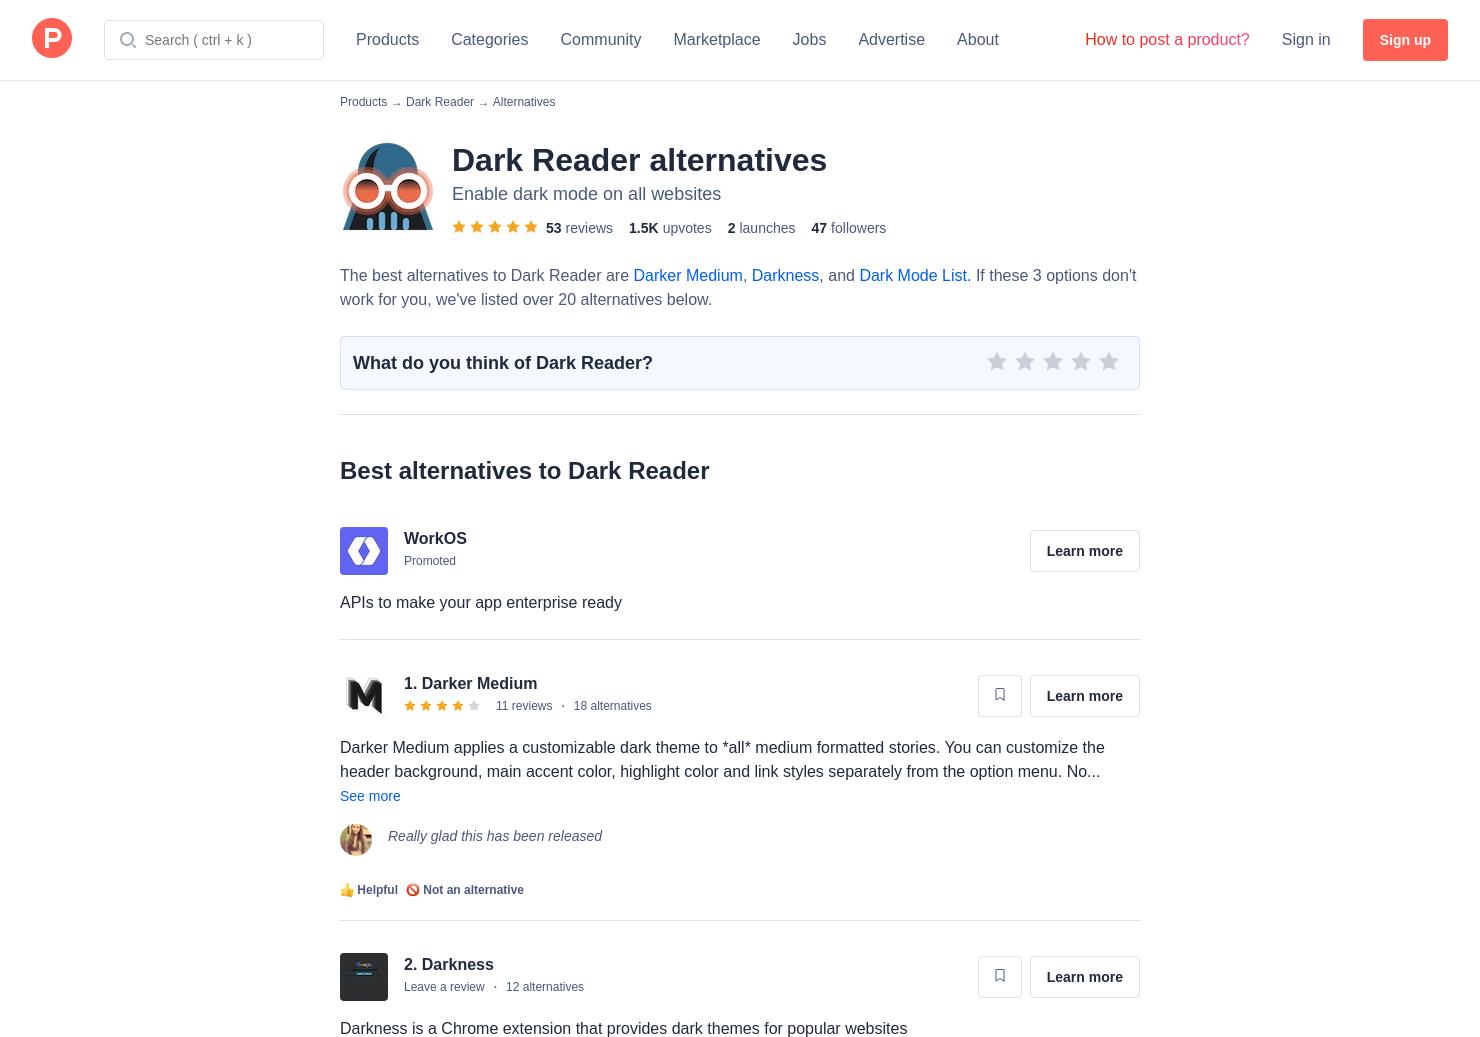 8 Alternatives to Dark Reader for Chrome Extensions